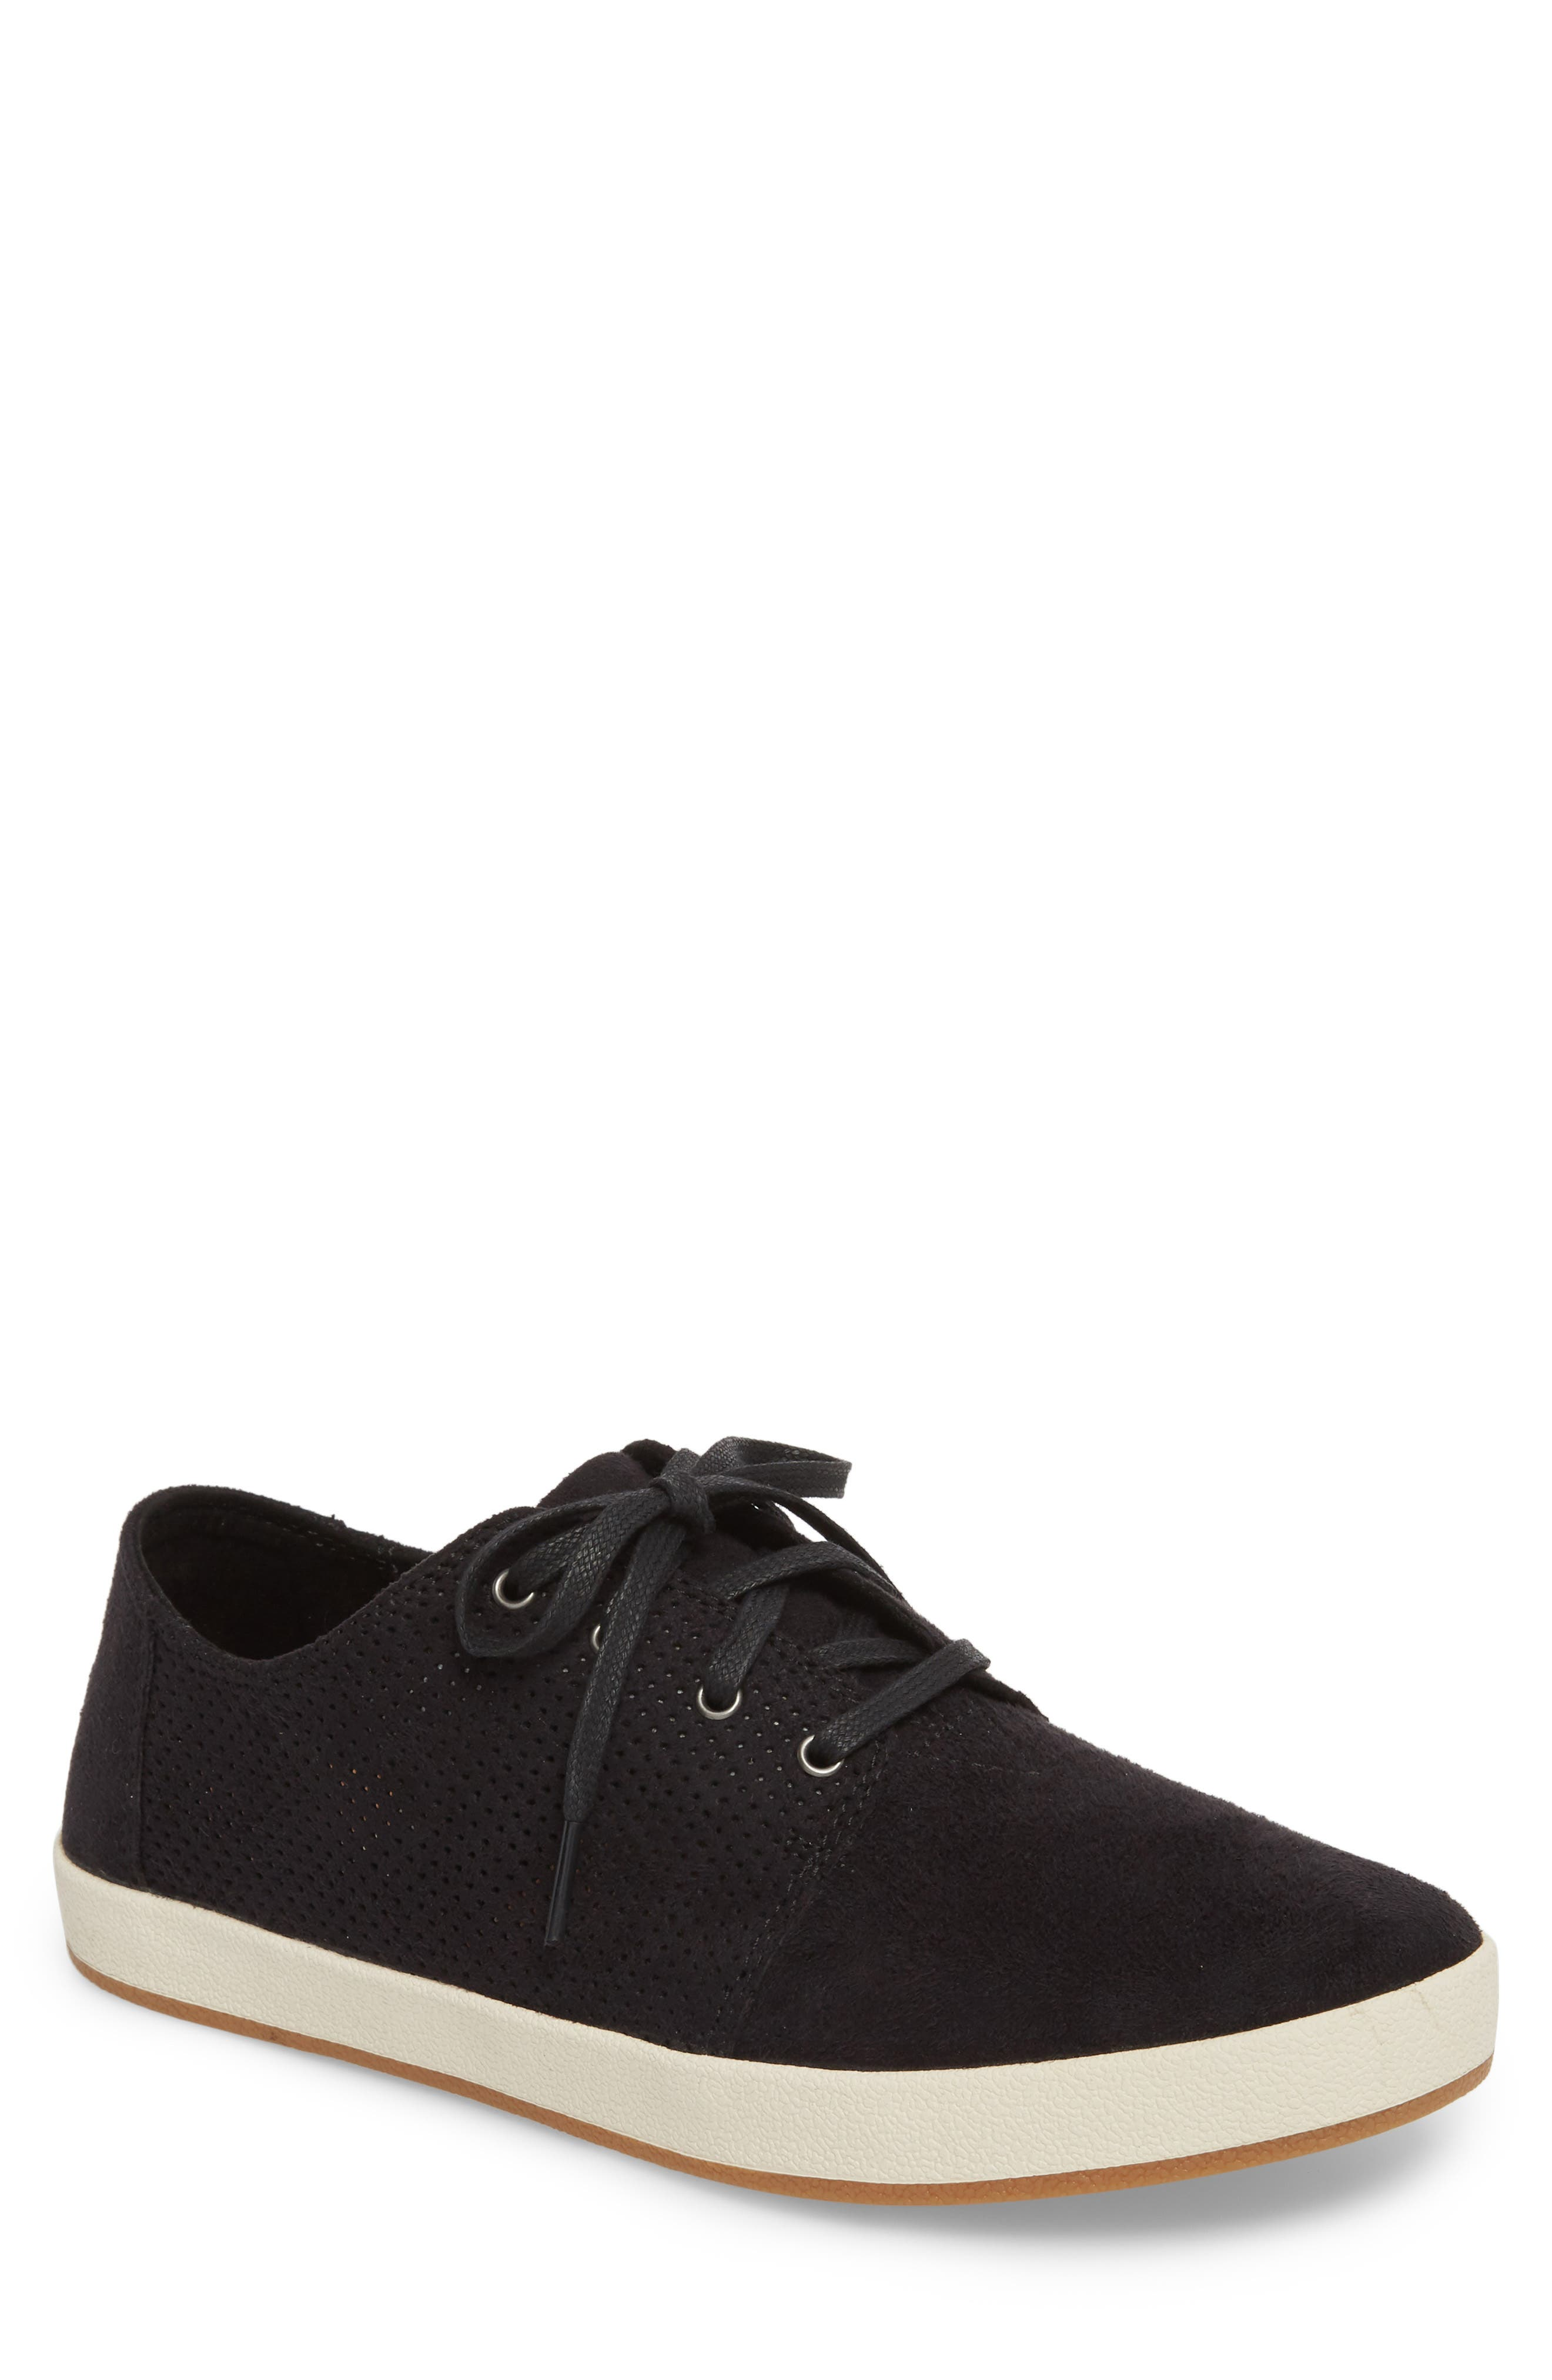 Payton Perforated Sneaker,                             Main thumbnail 1, color,                             001